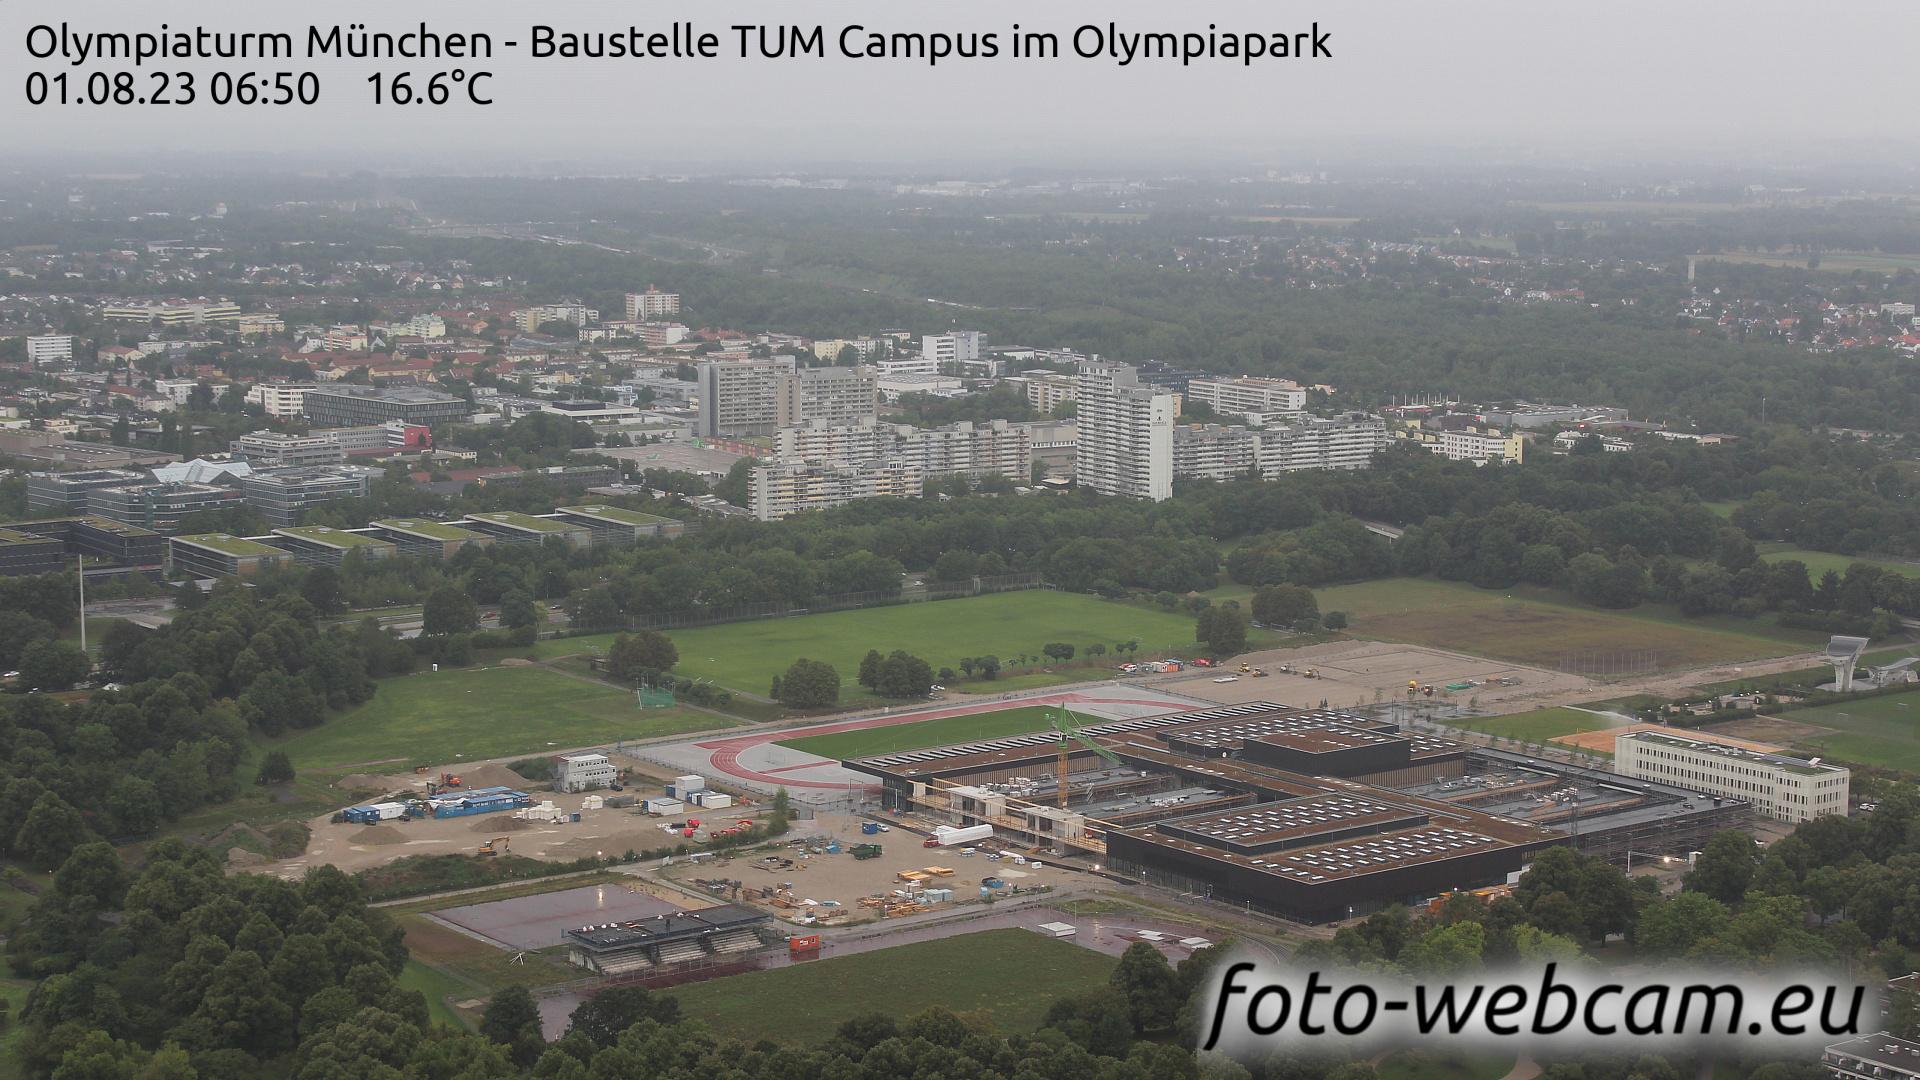 Munich Tue. 06:30